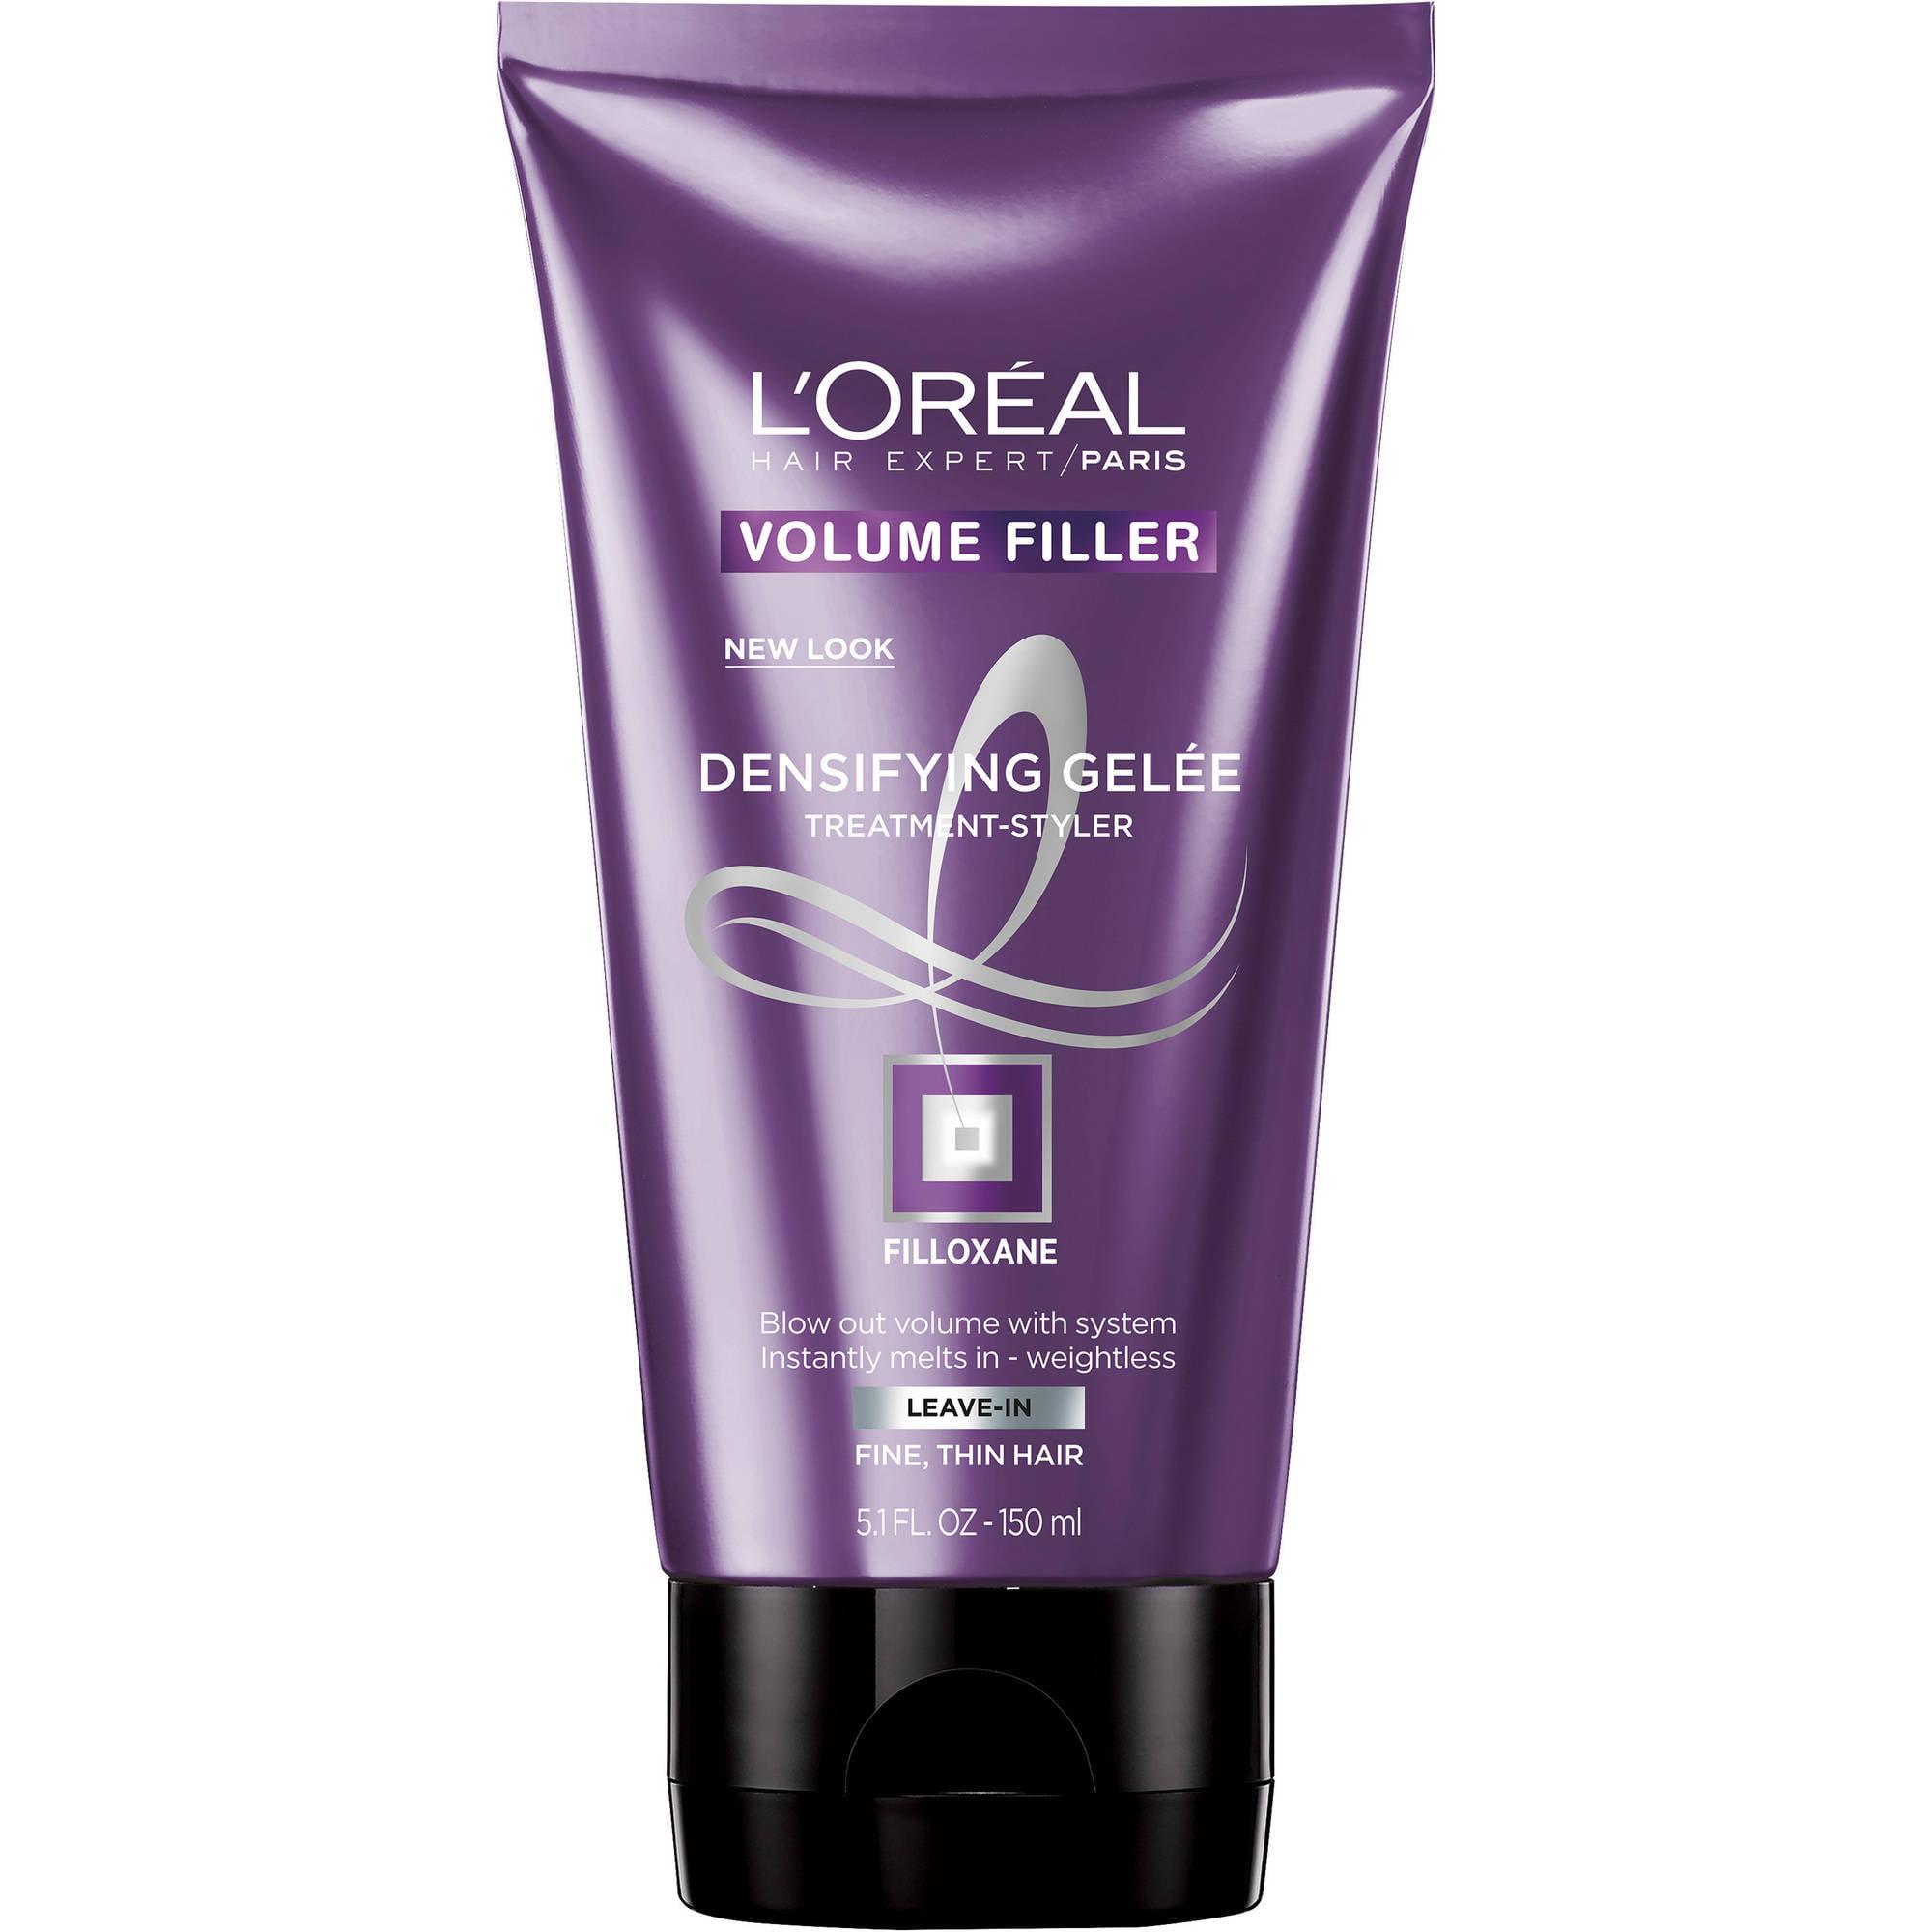 L'Oreal Paris Advanced Haircare Volume Filler Densifying Gelee, 5.1 fl oz